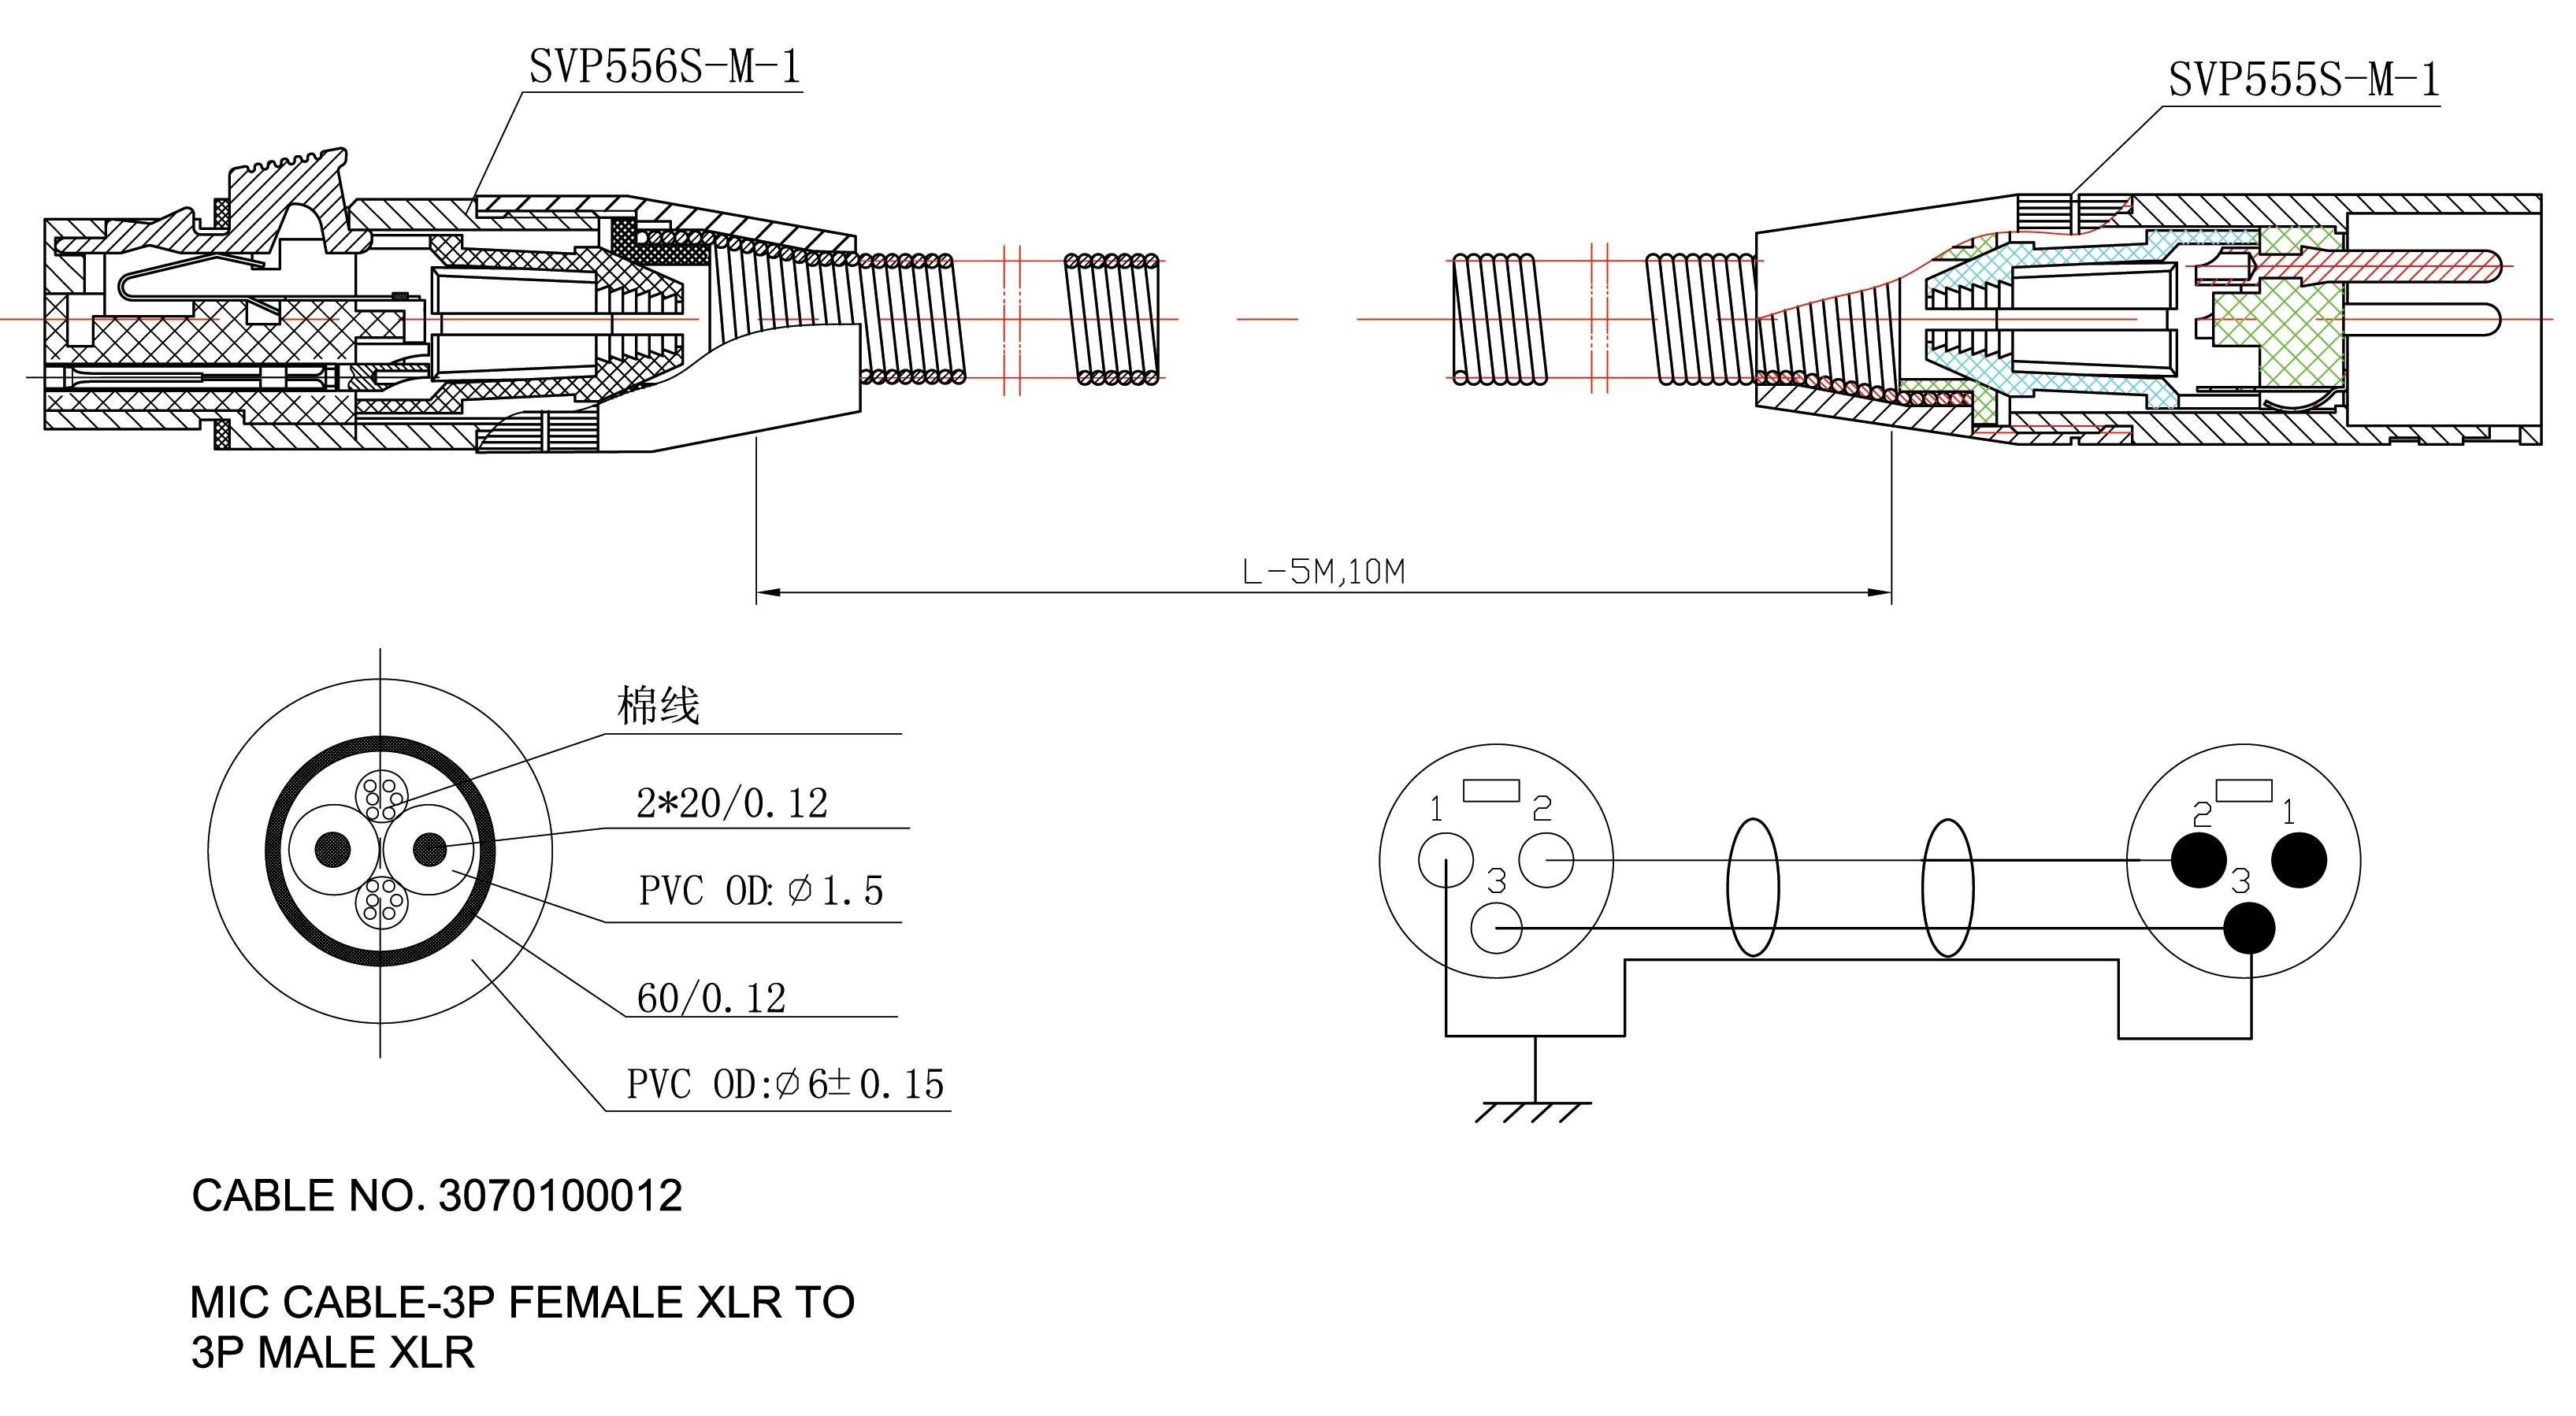 Honda 6 5 Hp Engine Parts Diagram 2 Electric Motor Parts Diagram sources Of Honda 6 5 Hp Engine Parts Diagram 2